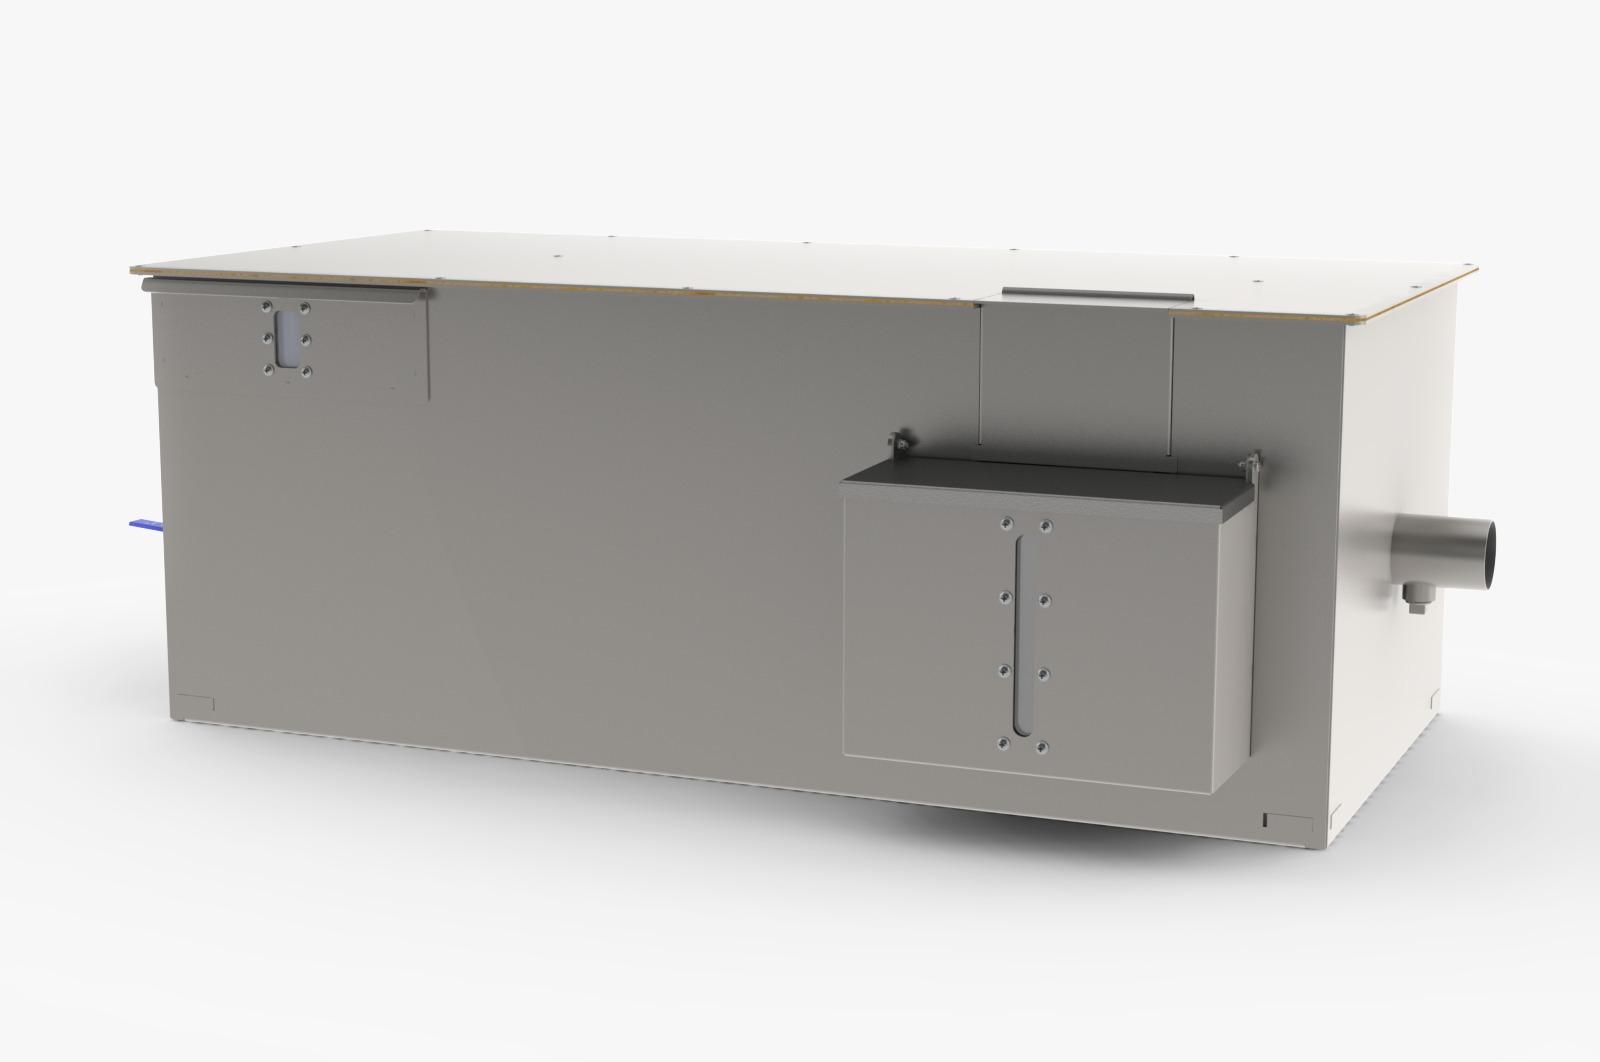 HC4 Grease removal unit - Fog Fellow Designs LTD